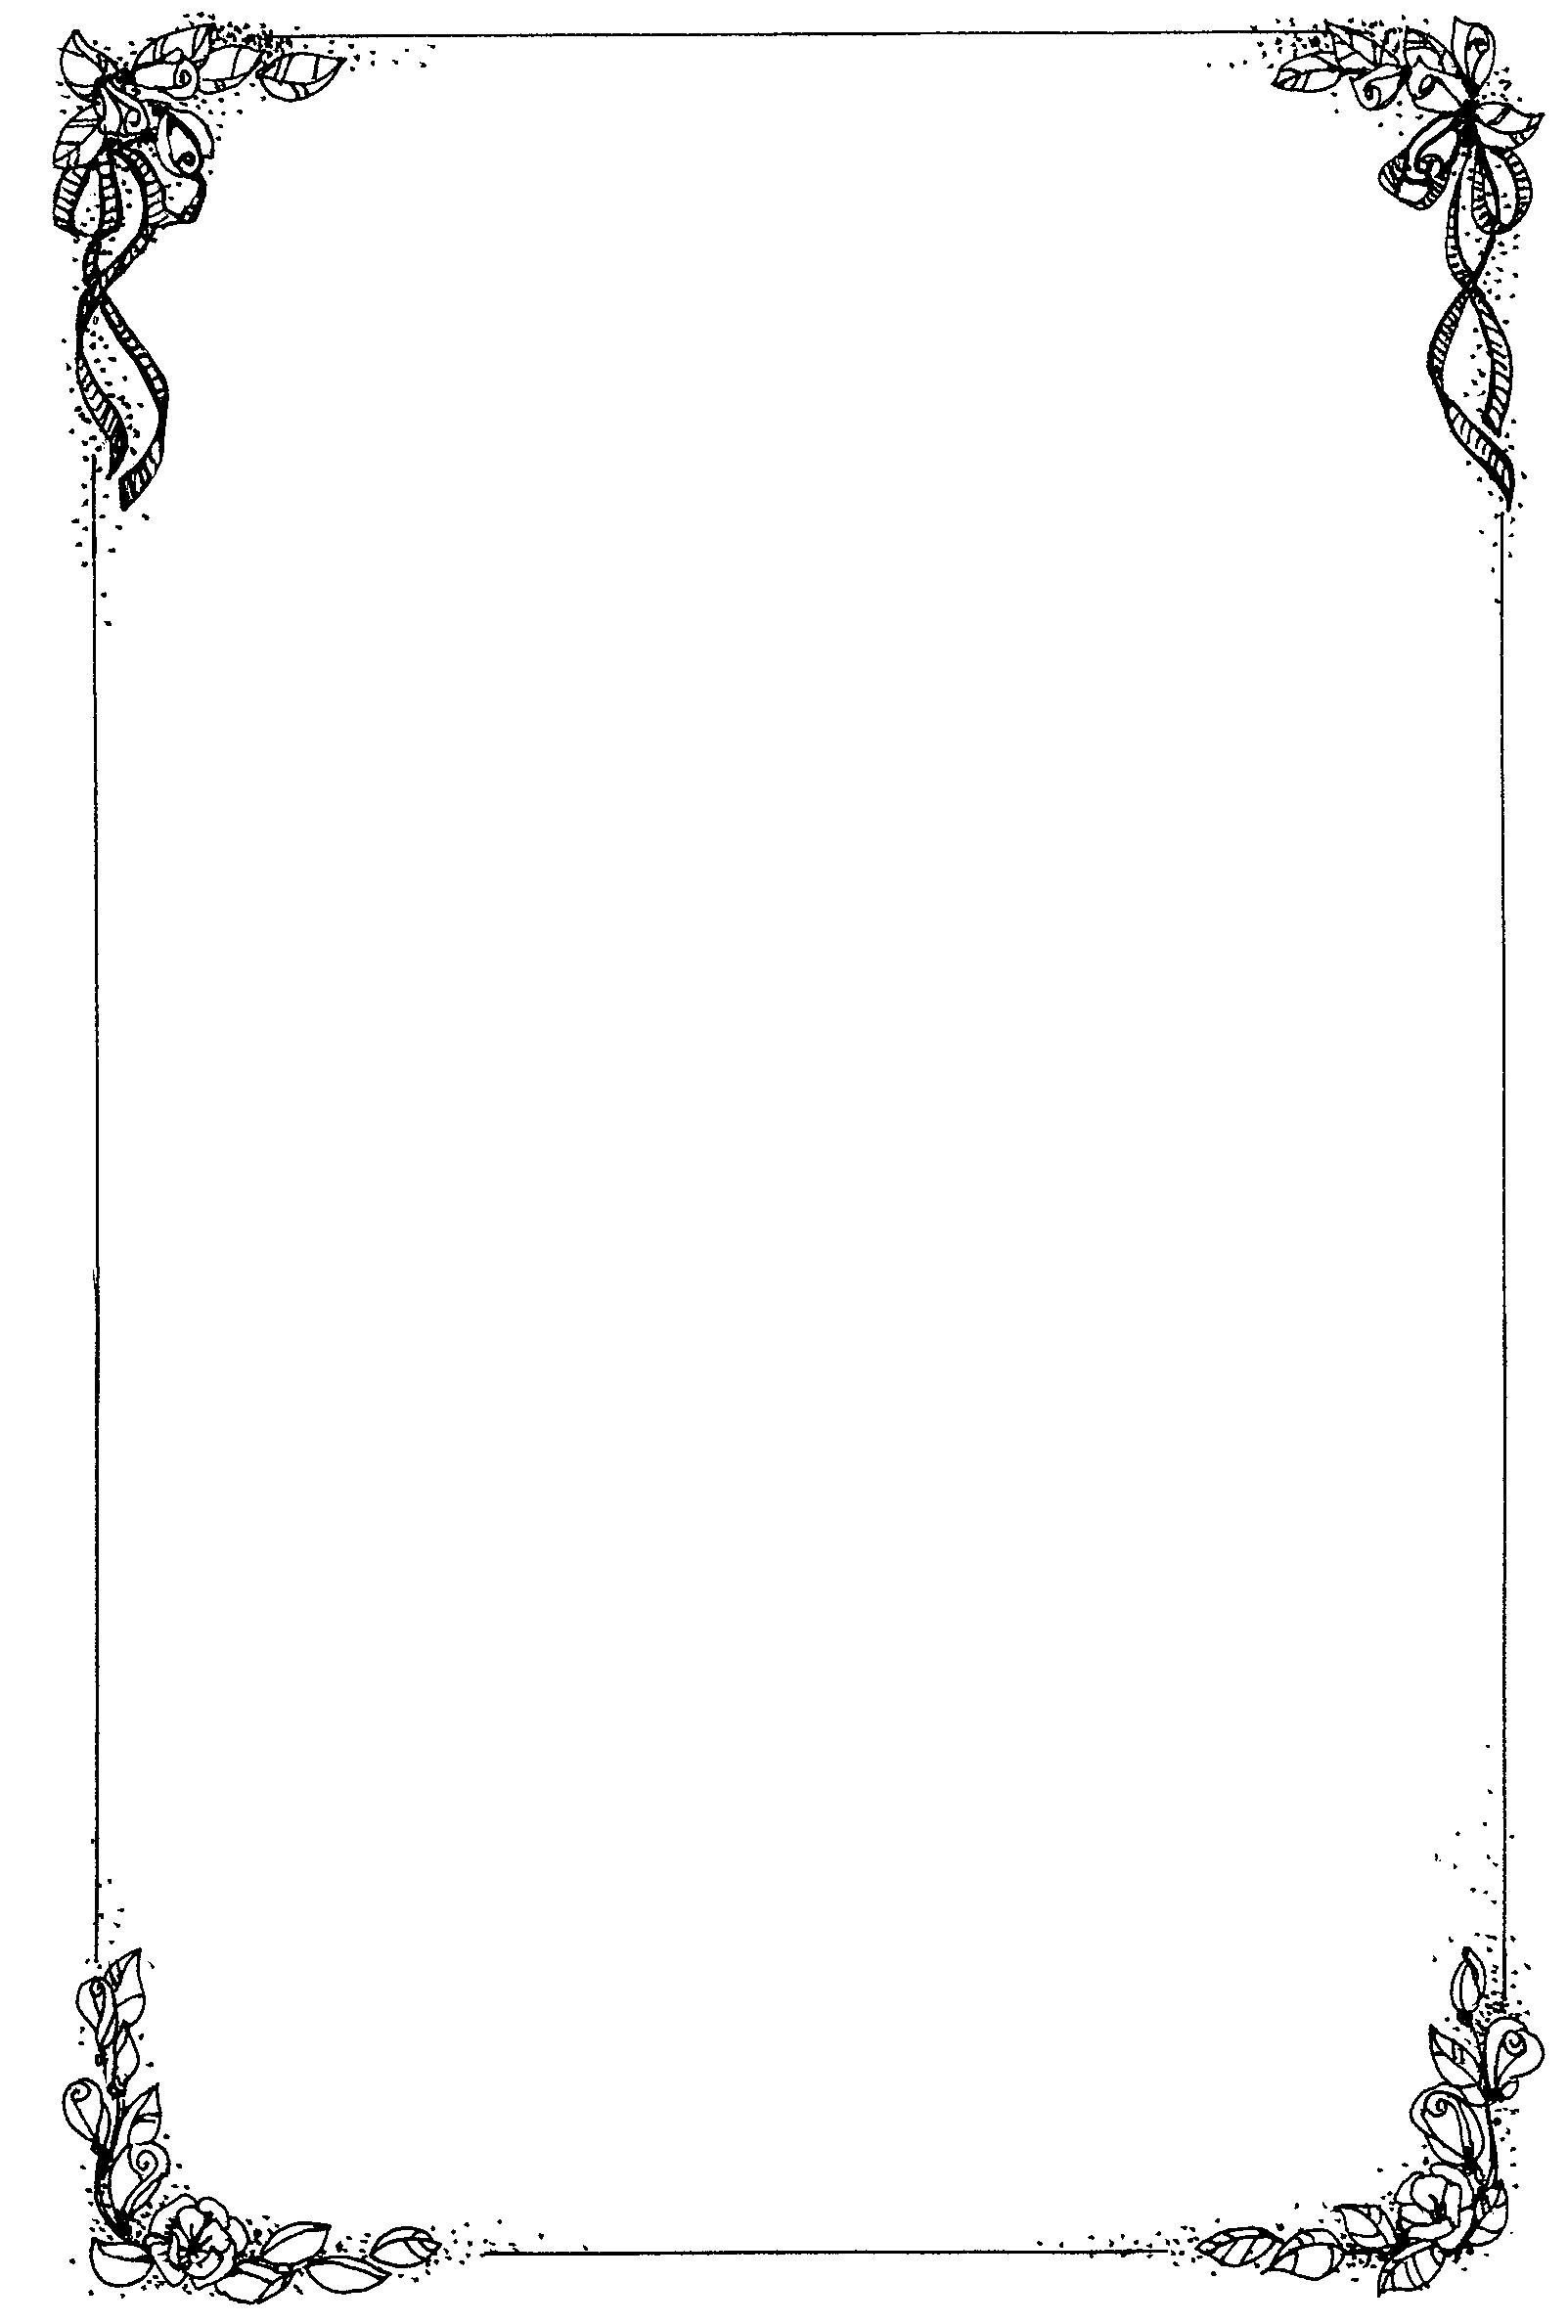 Free Bride Border Cliparts, Download Free Clip Art, Free.